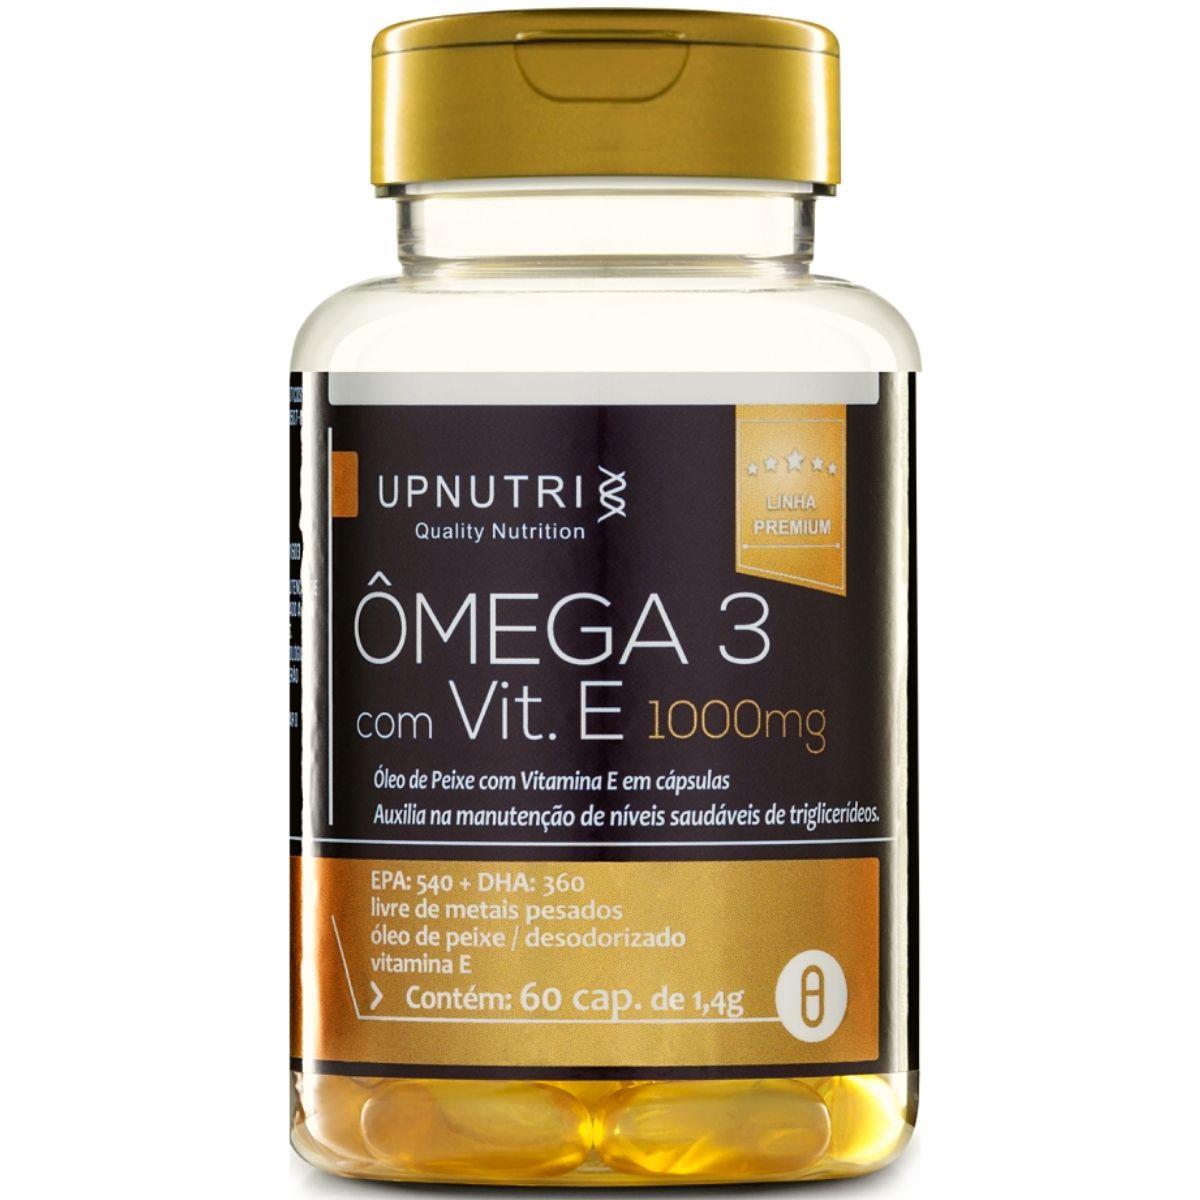 Ômega 3 + Vitamina E 60 Cápsulas 1000mg - Upnutri Premium